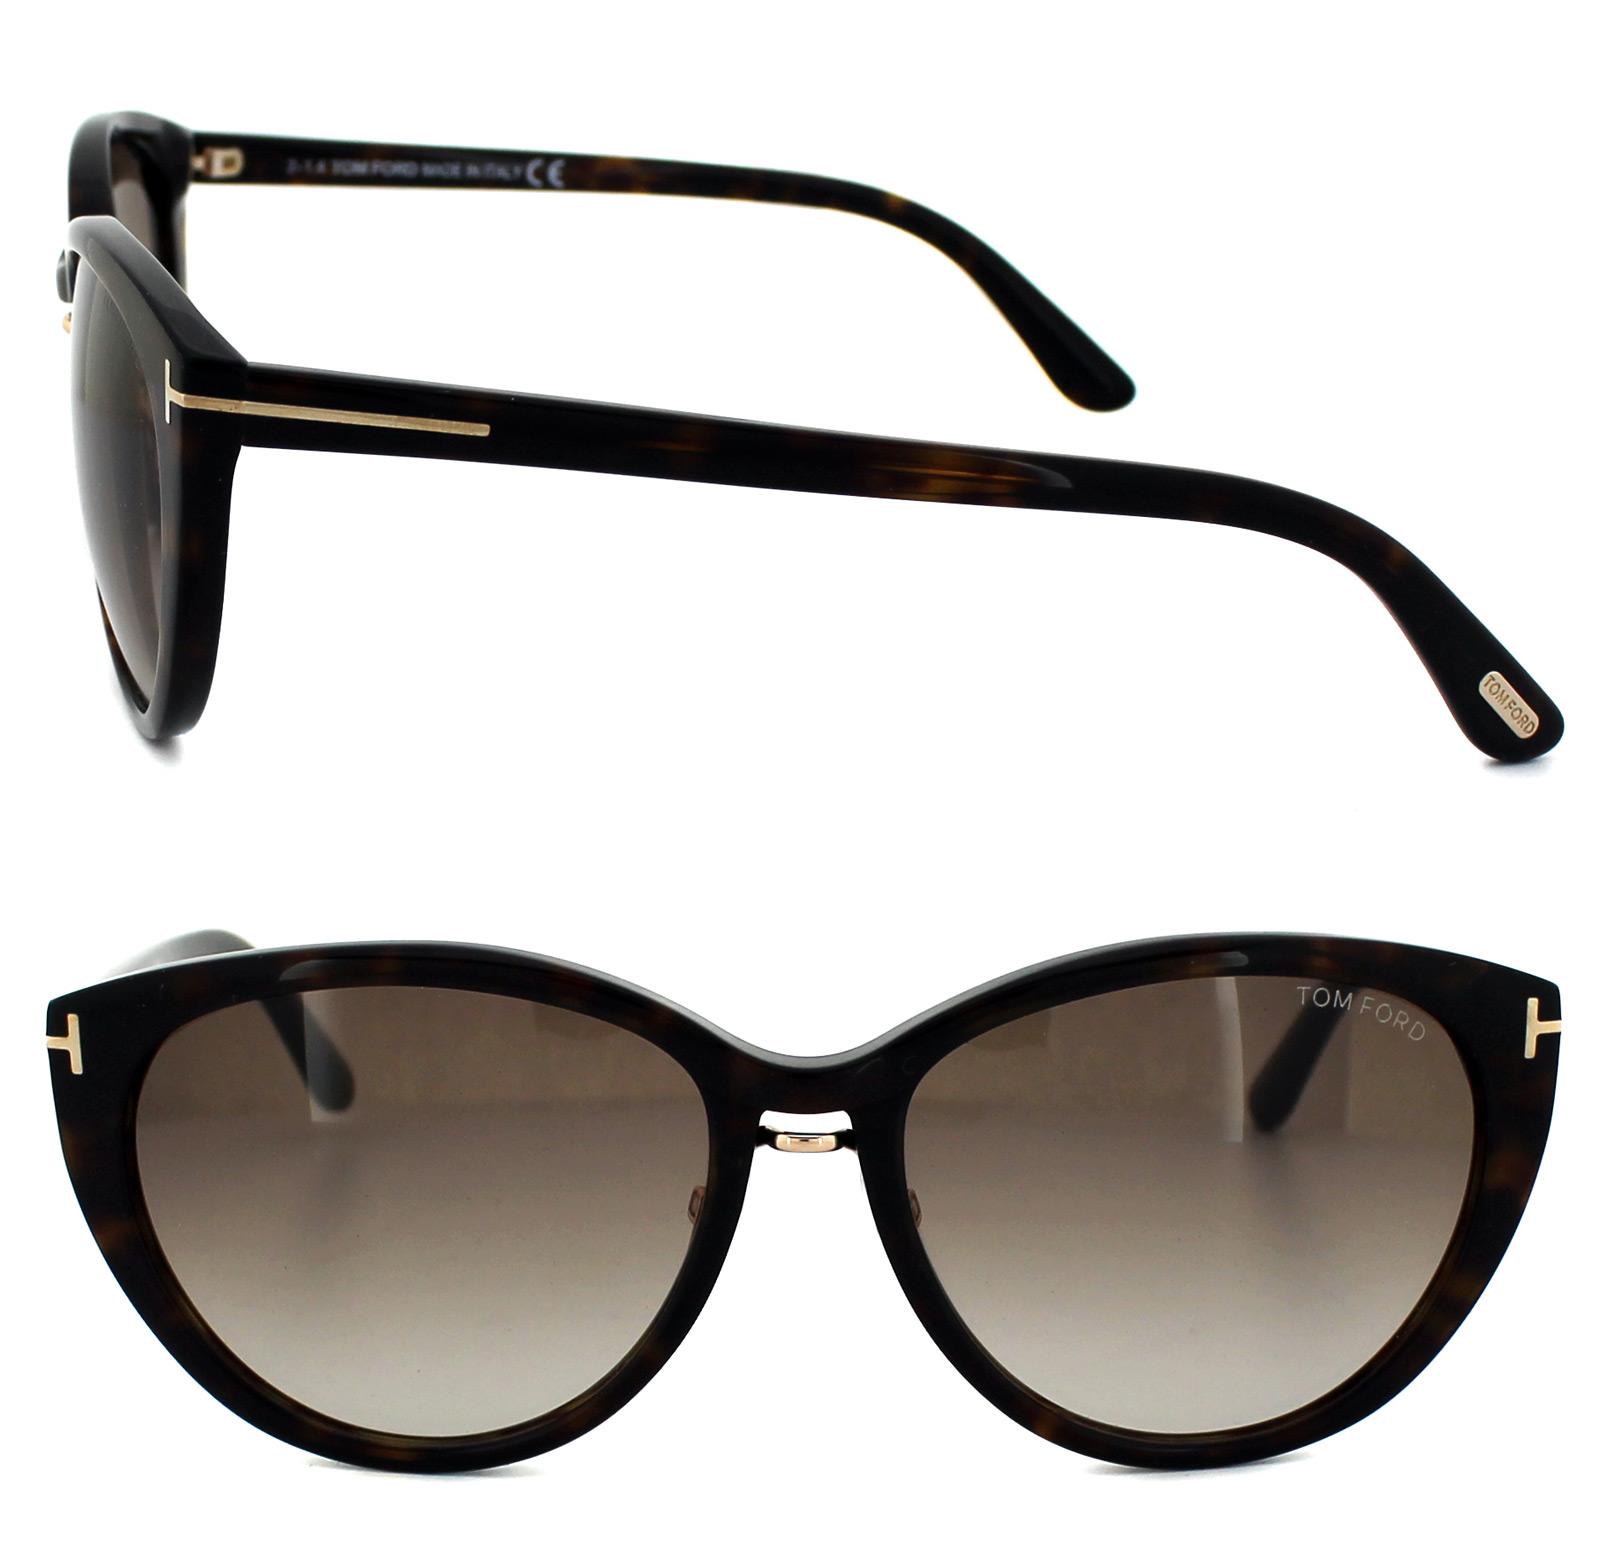 Cheap Tom Ford 0345 Gina Sunglasses Discounted Sunglasses